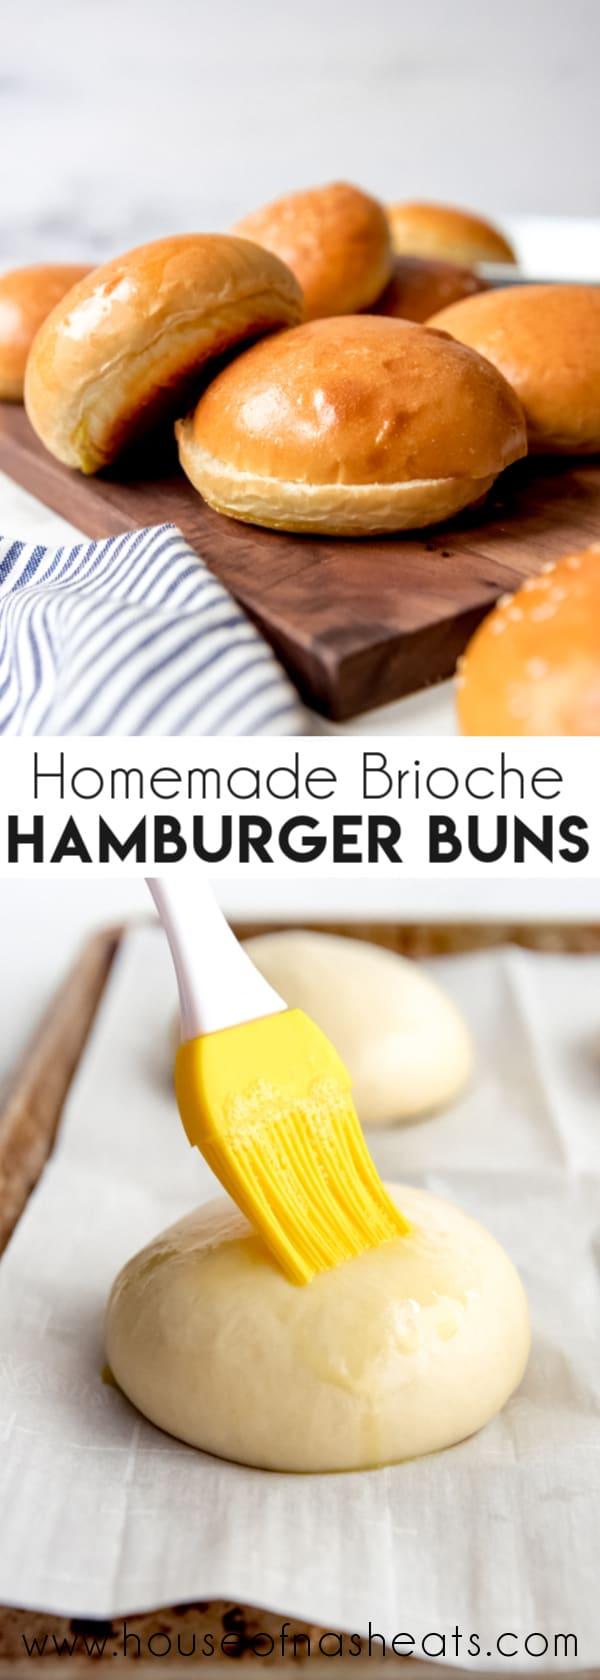 Homemade Brioche Hamburger Buns - House of Nash Eats